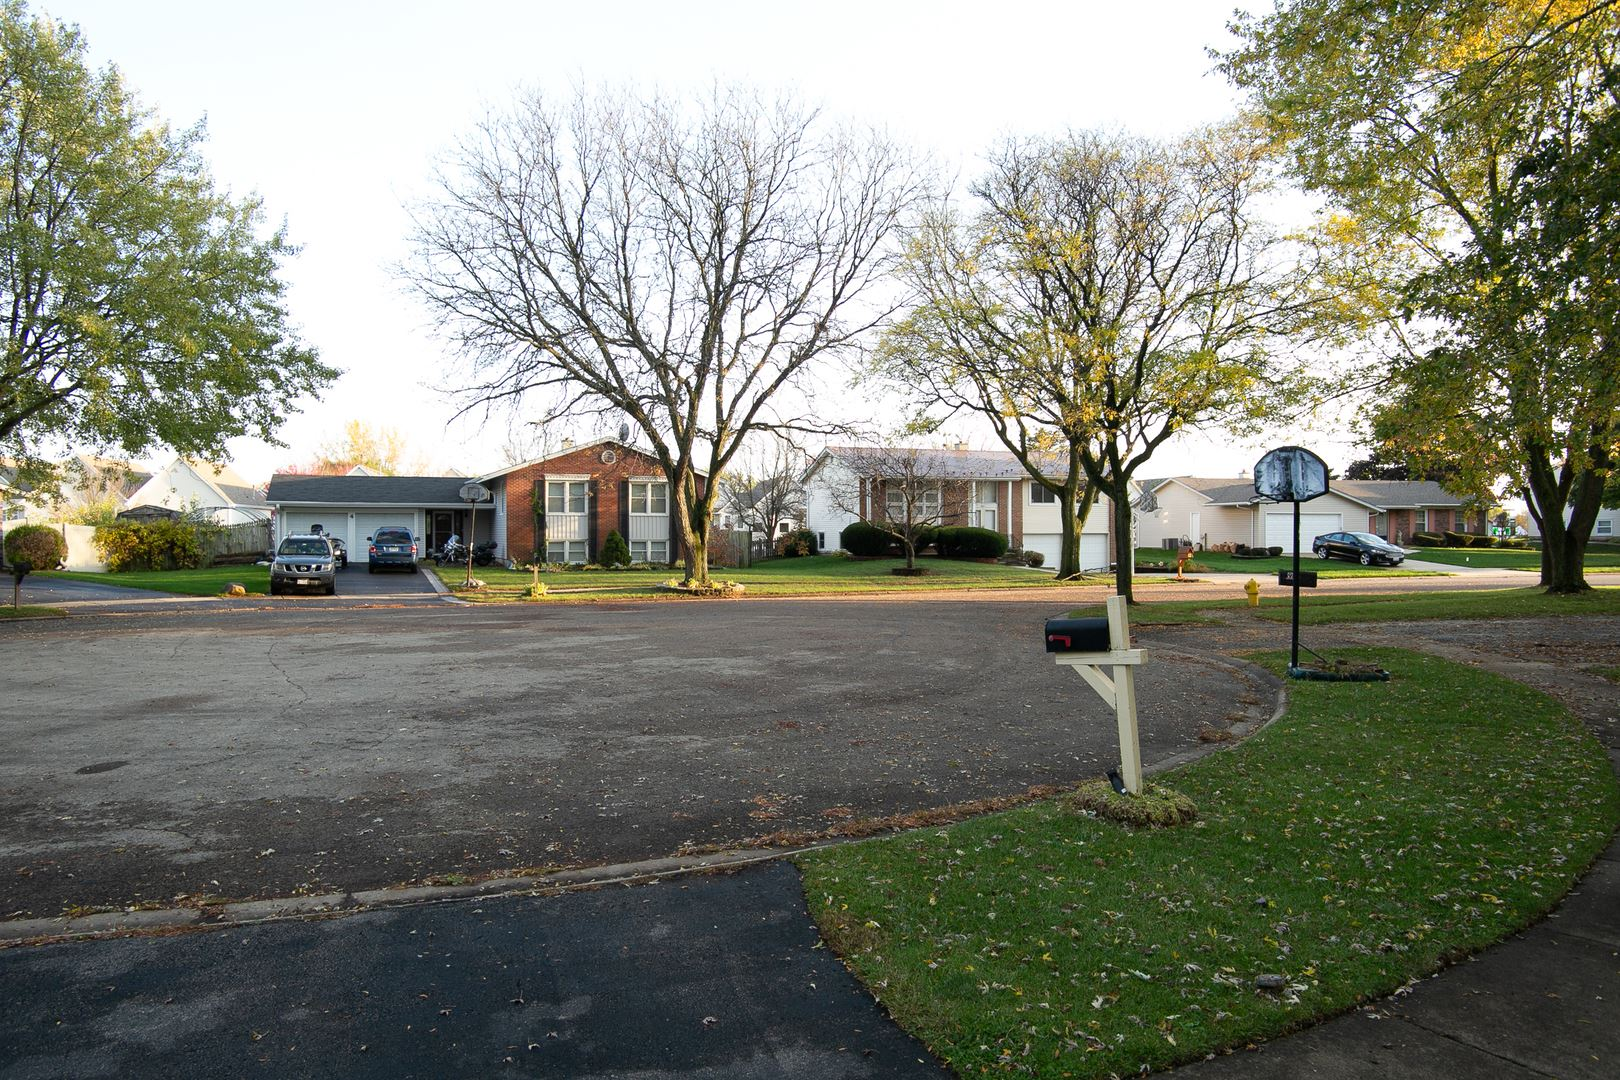 Photo of 7 Ashbury Court, Bolingbrook, IL 60440 (MLS # 10914925)